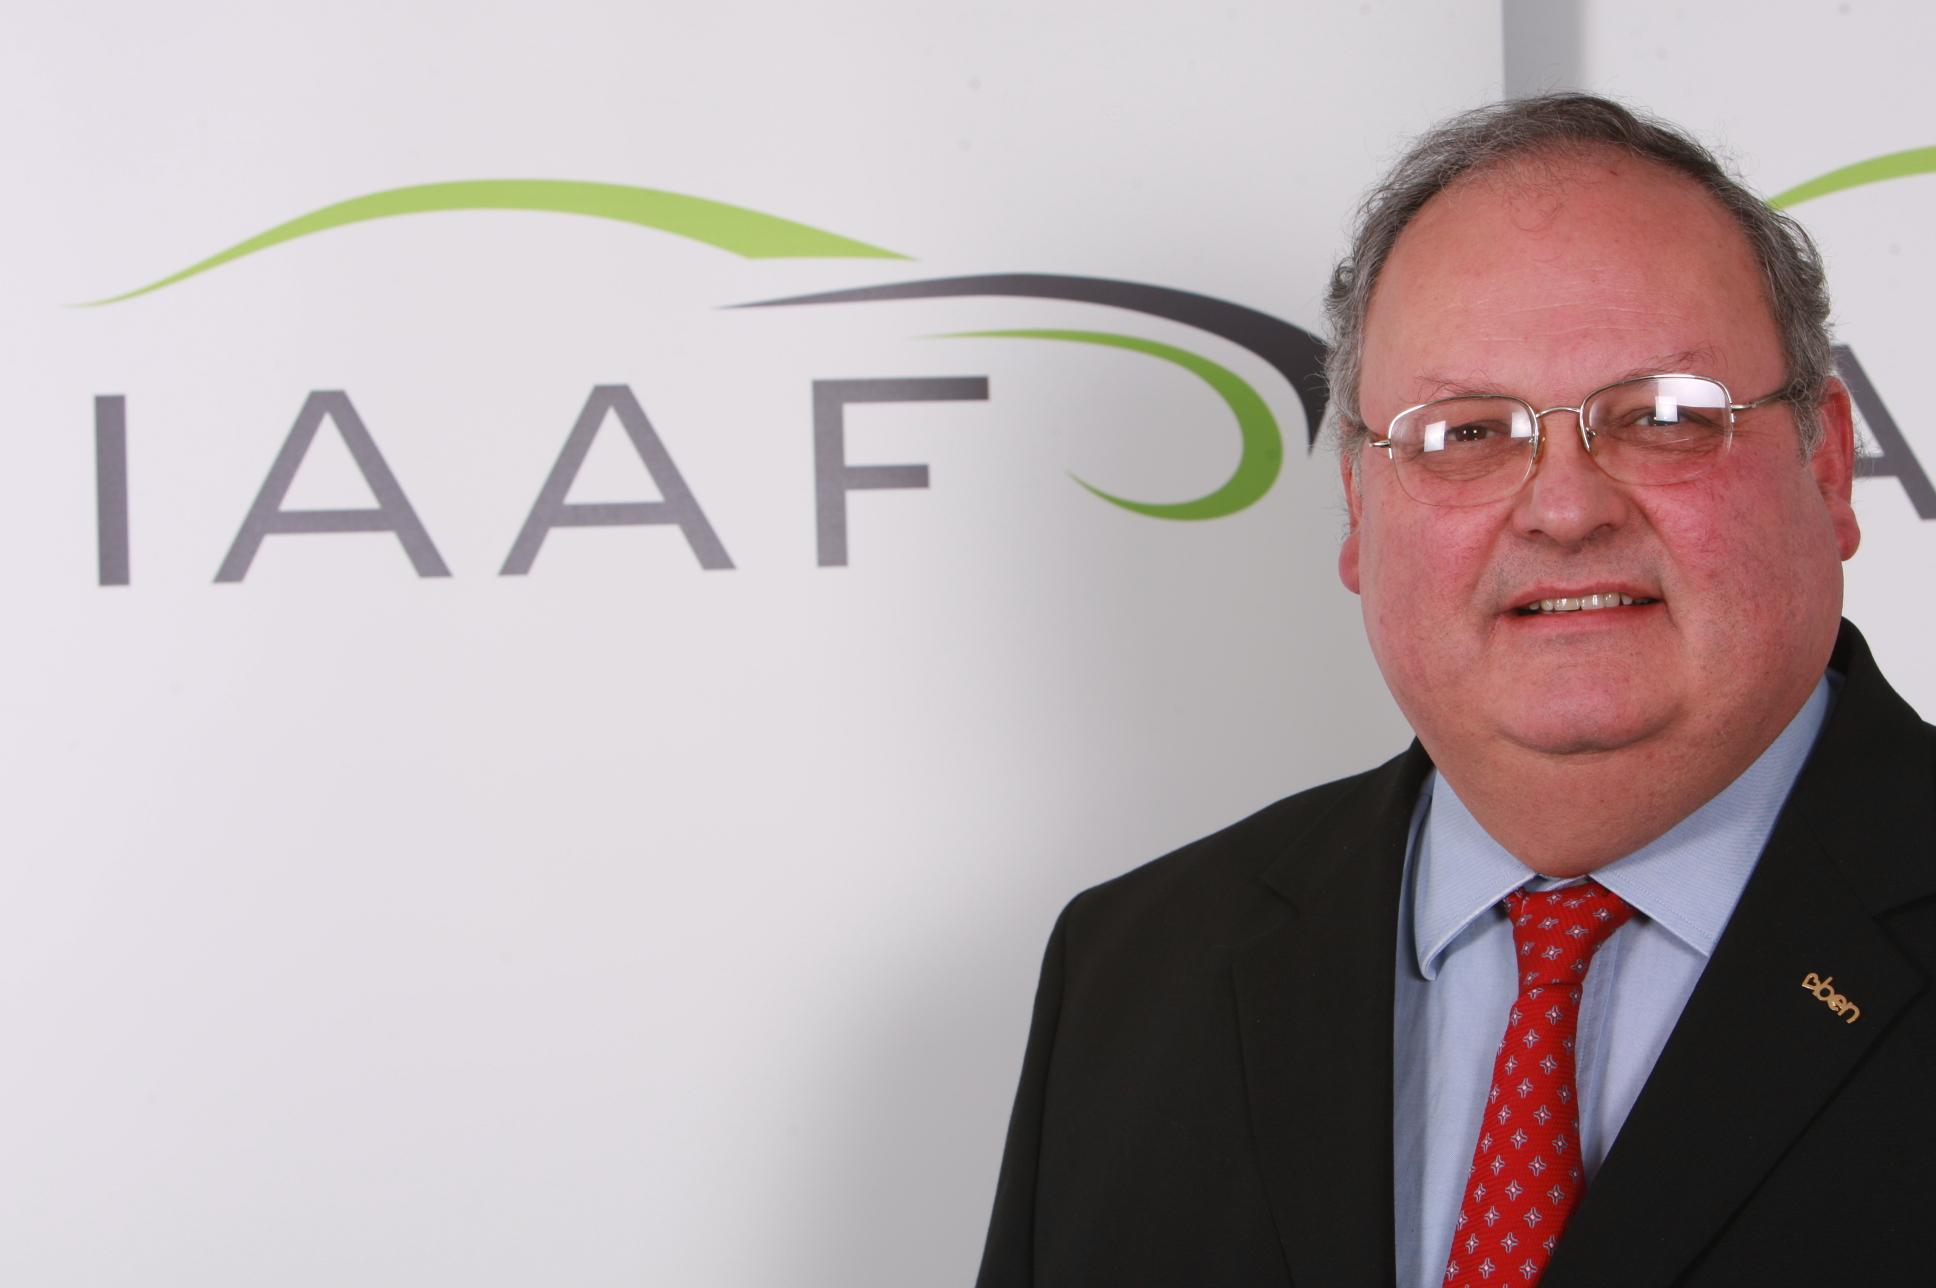 IAAF chief executive Brian Spratt